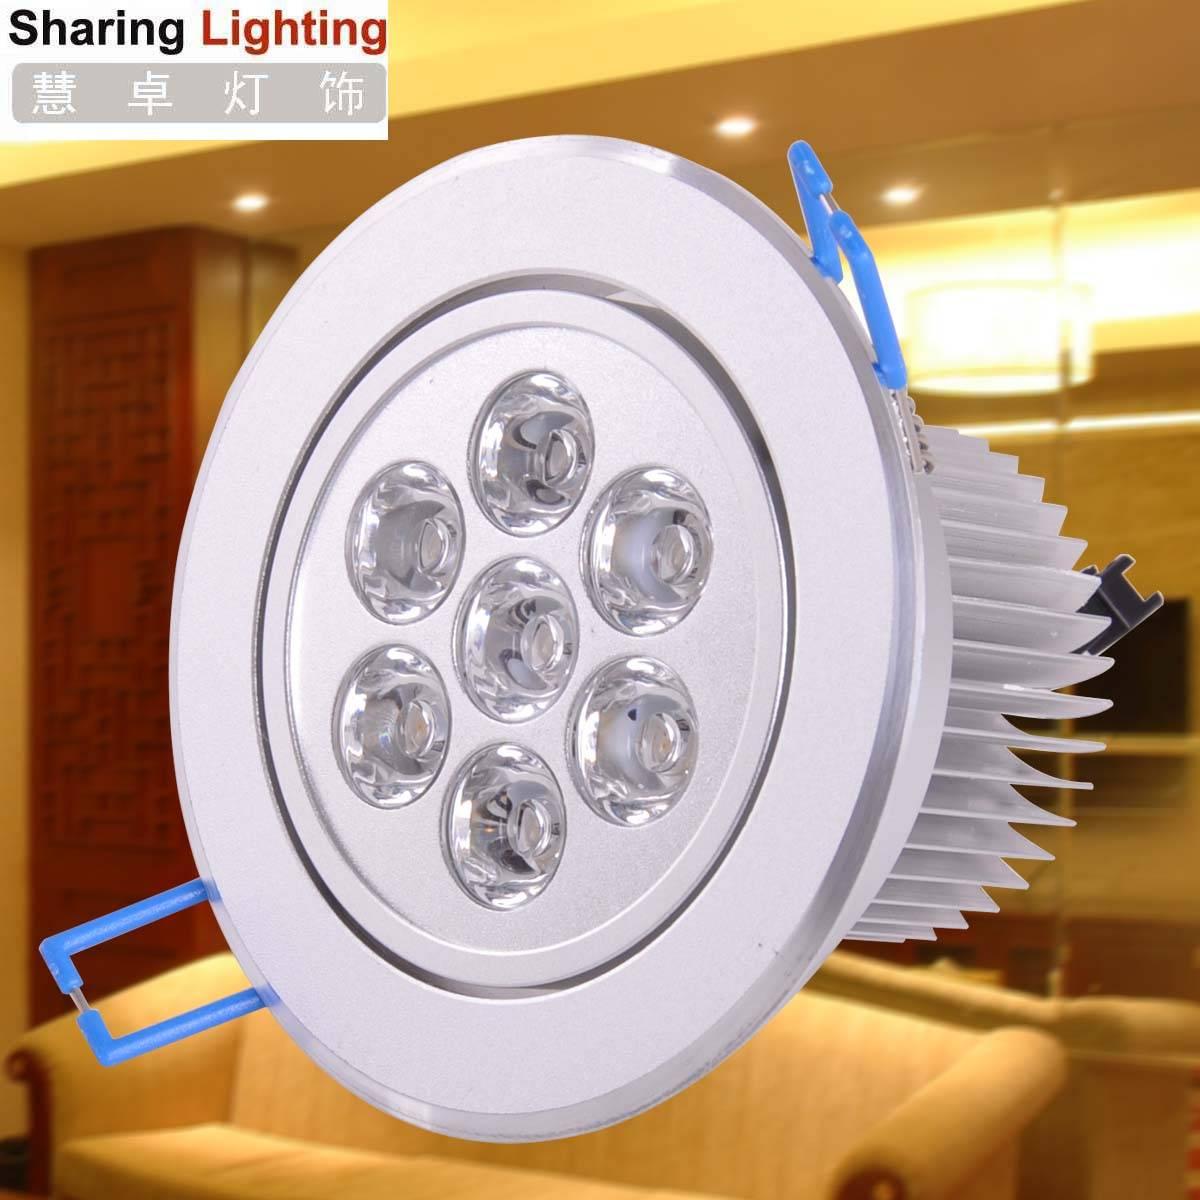 7W LED high power led downlight,wholesale led lights,High energy led downlights